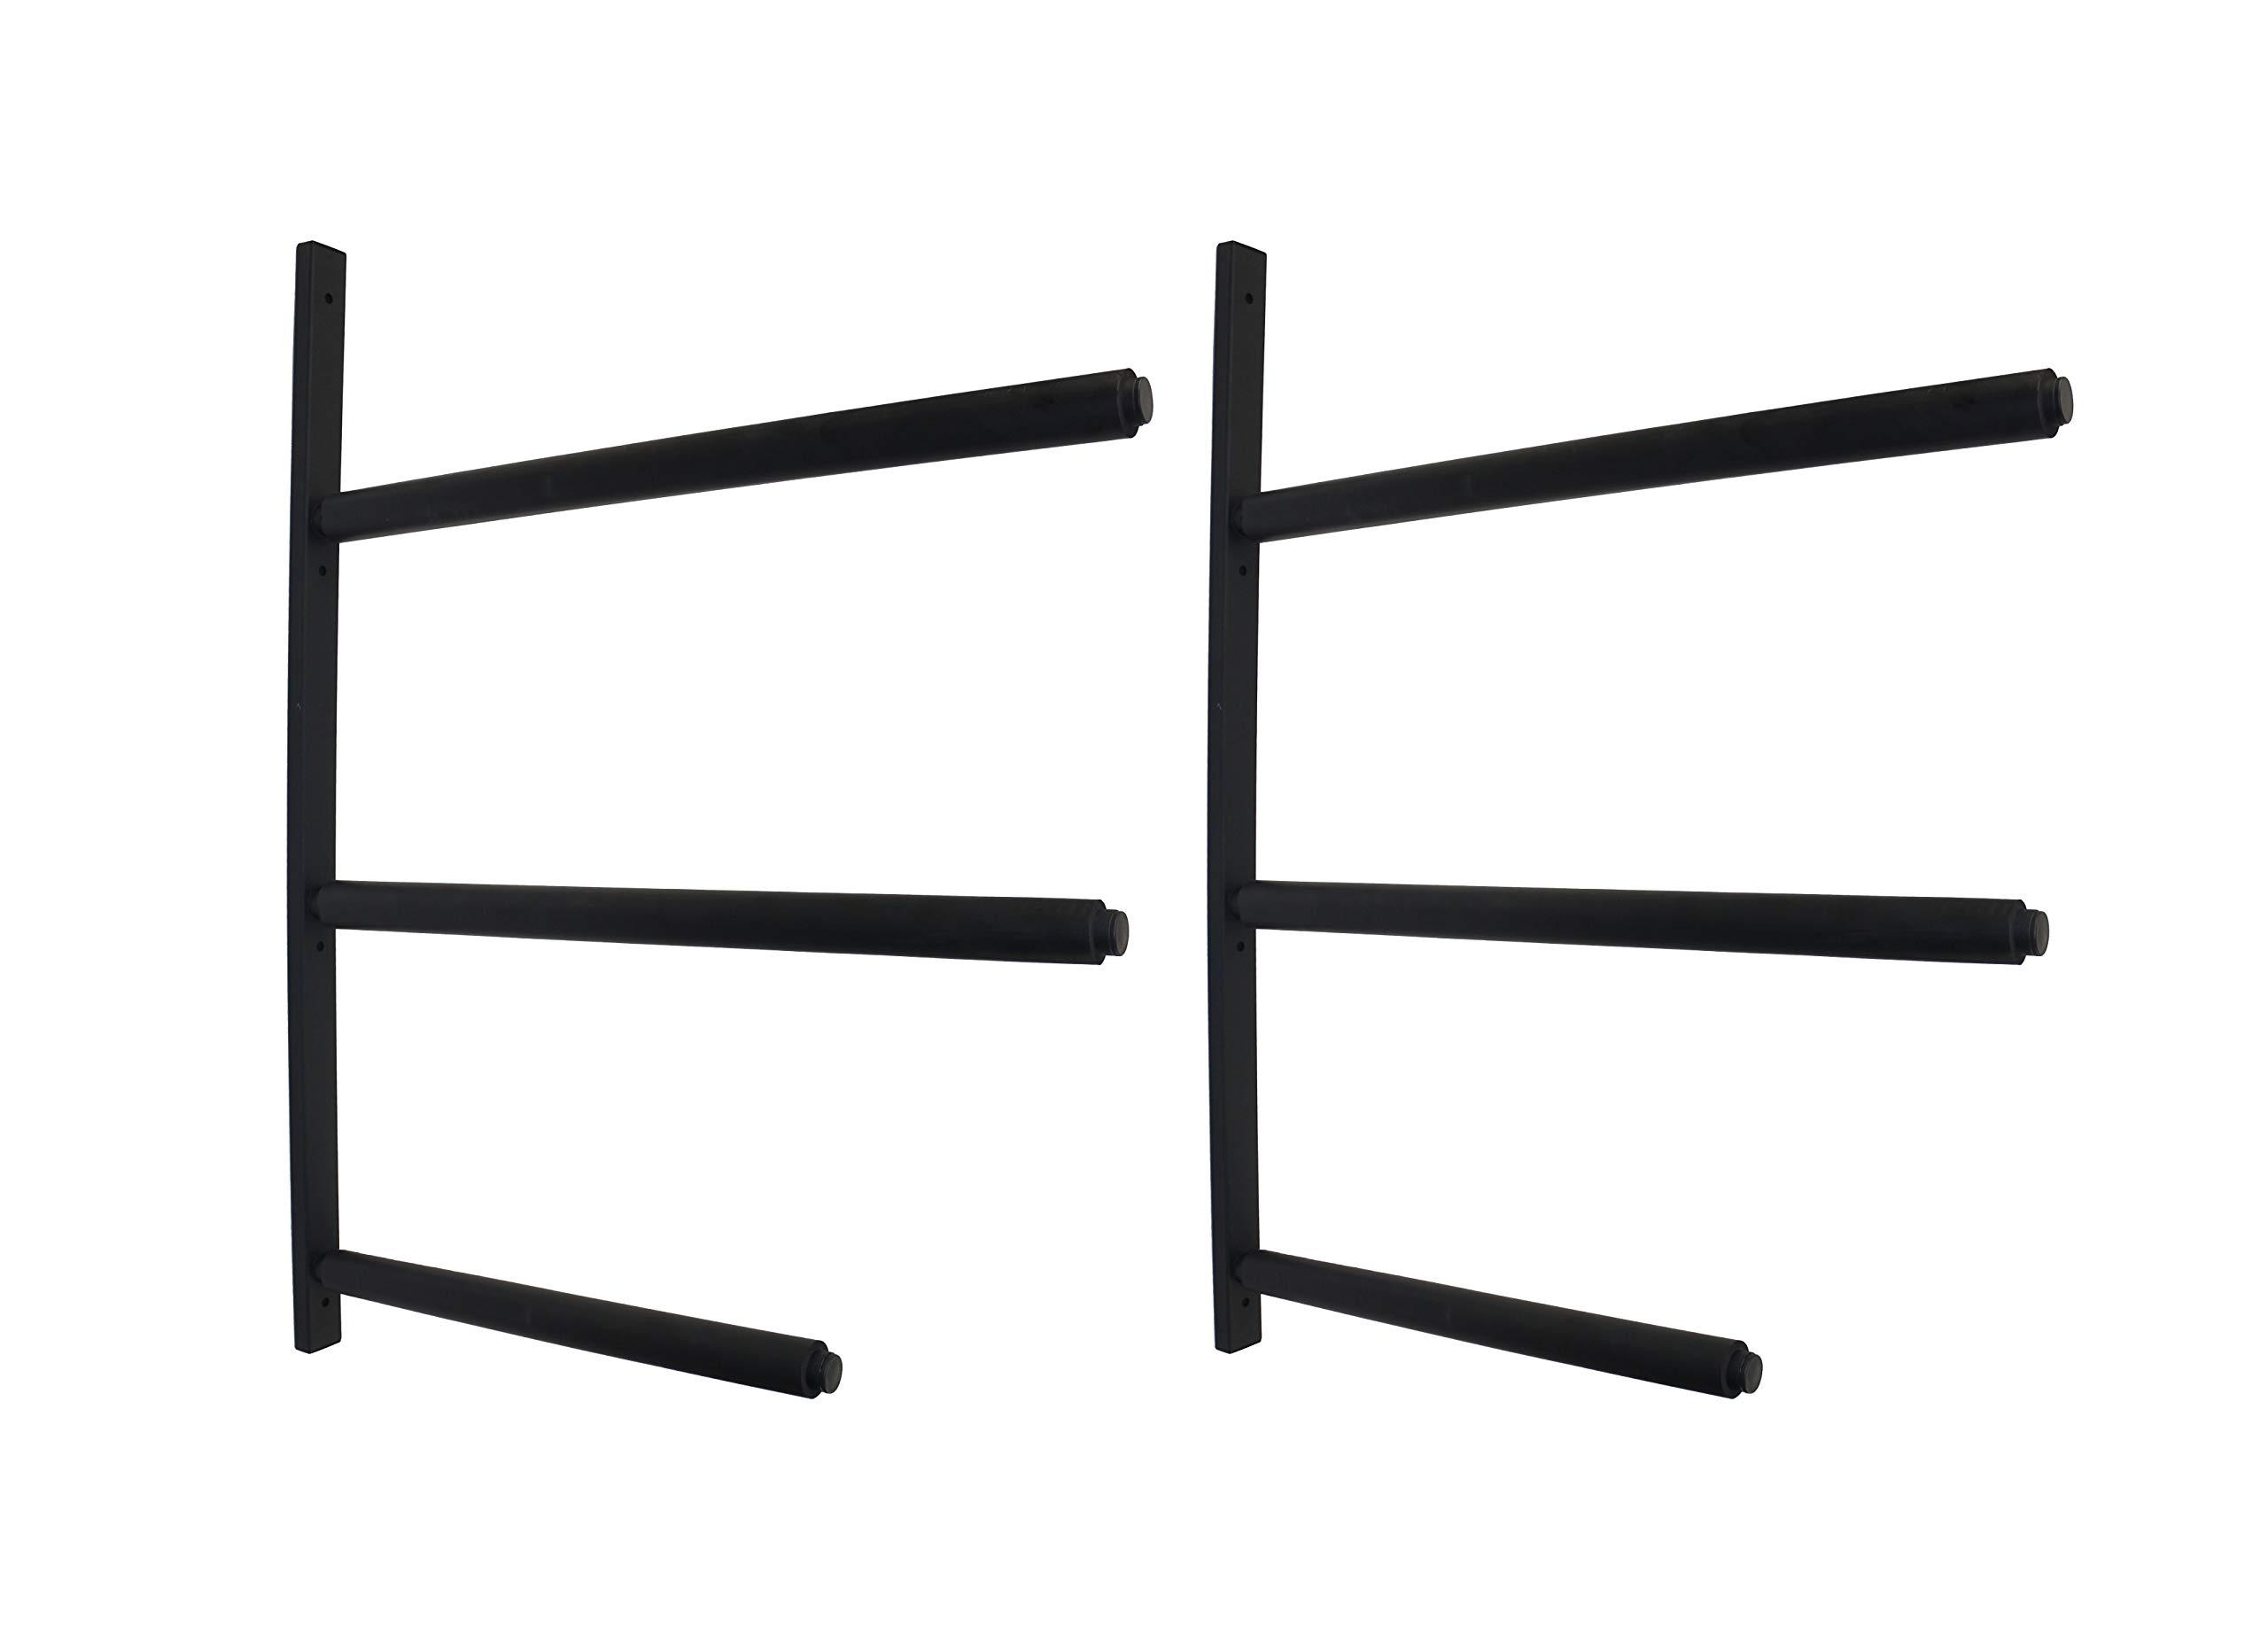 Mrhardware SUP Snowboard Surfboard Paddle Board Ski Wall Mount Storage Display Rack Cradle (Black, 3 Boards)